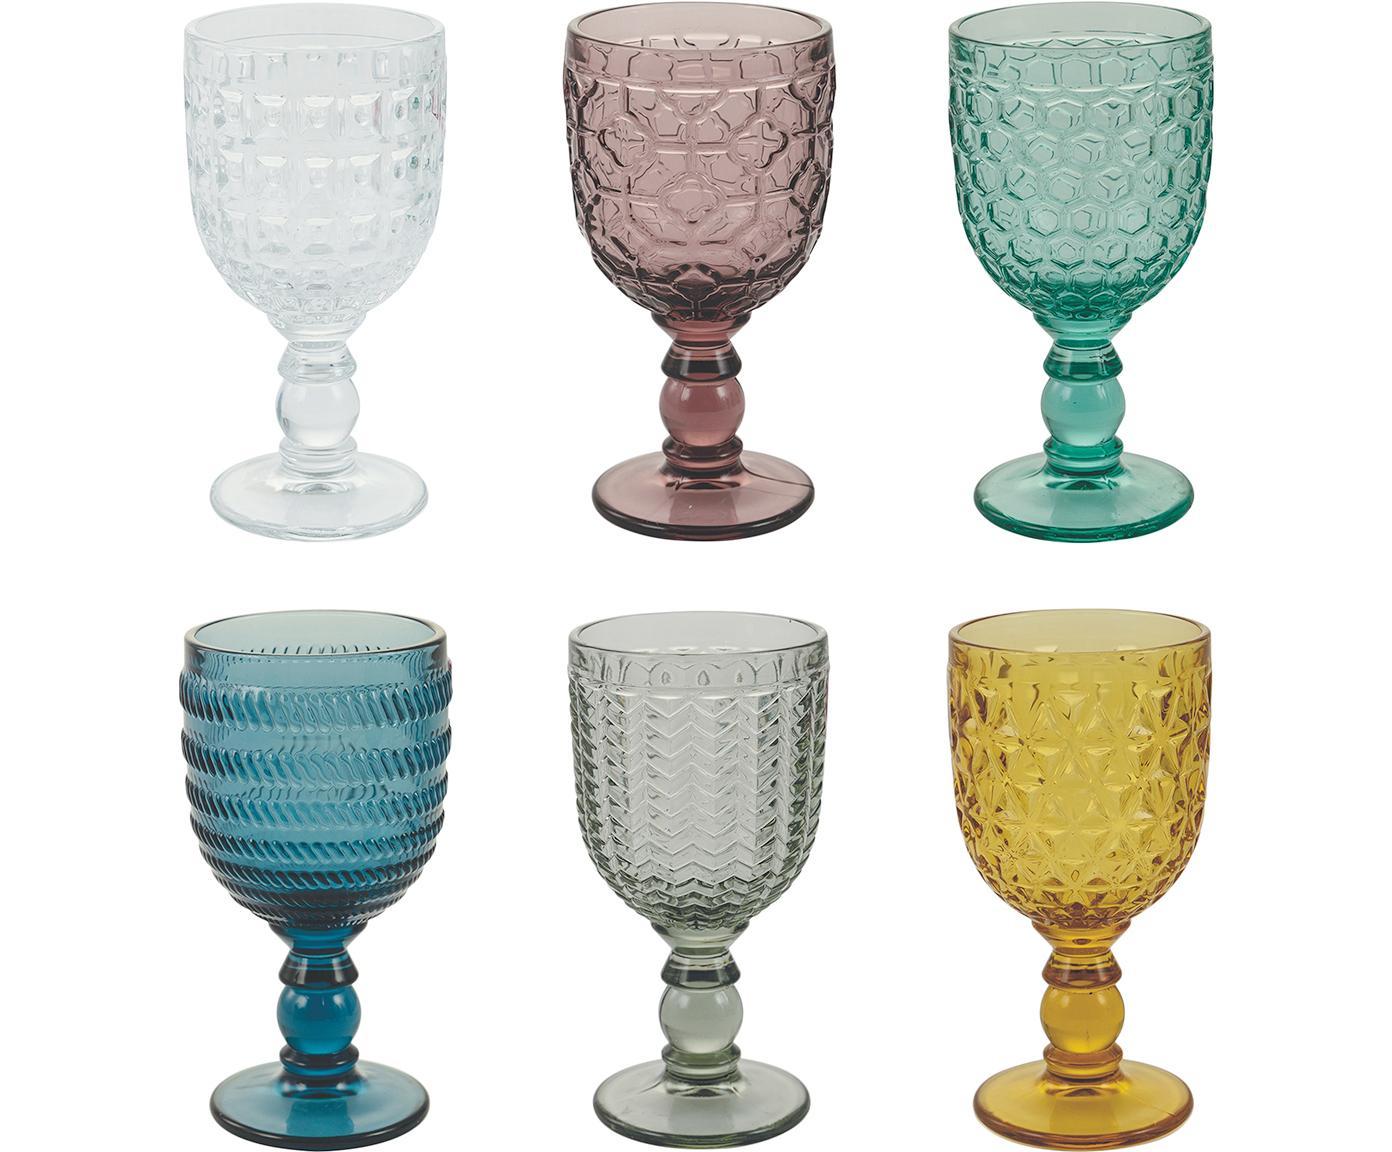 Wijnglazen Geometrie met structuurpatroon in kleur, 6-delig, Glas, Multicolour, Ø 9 x H 17 cm